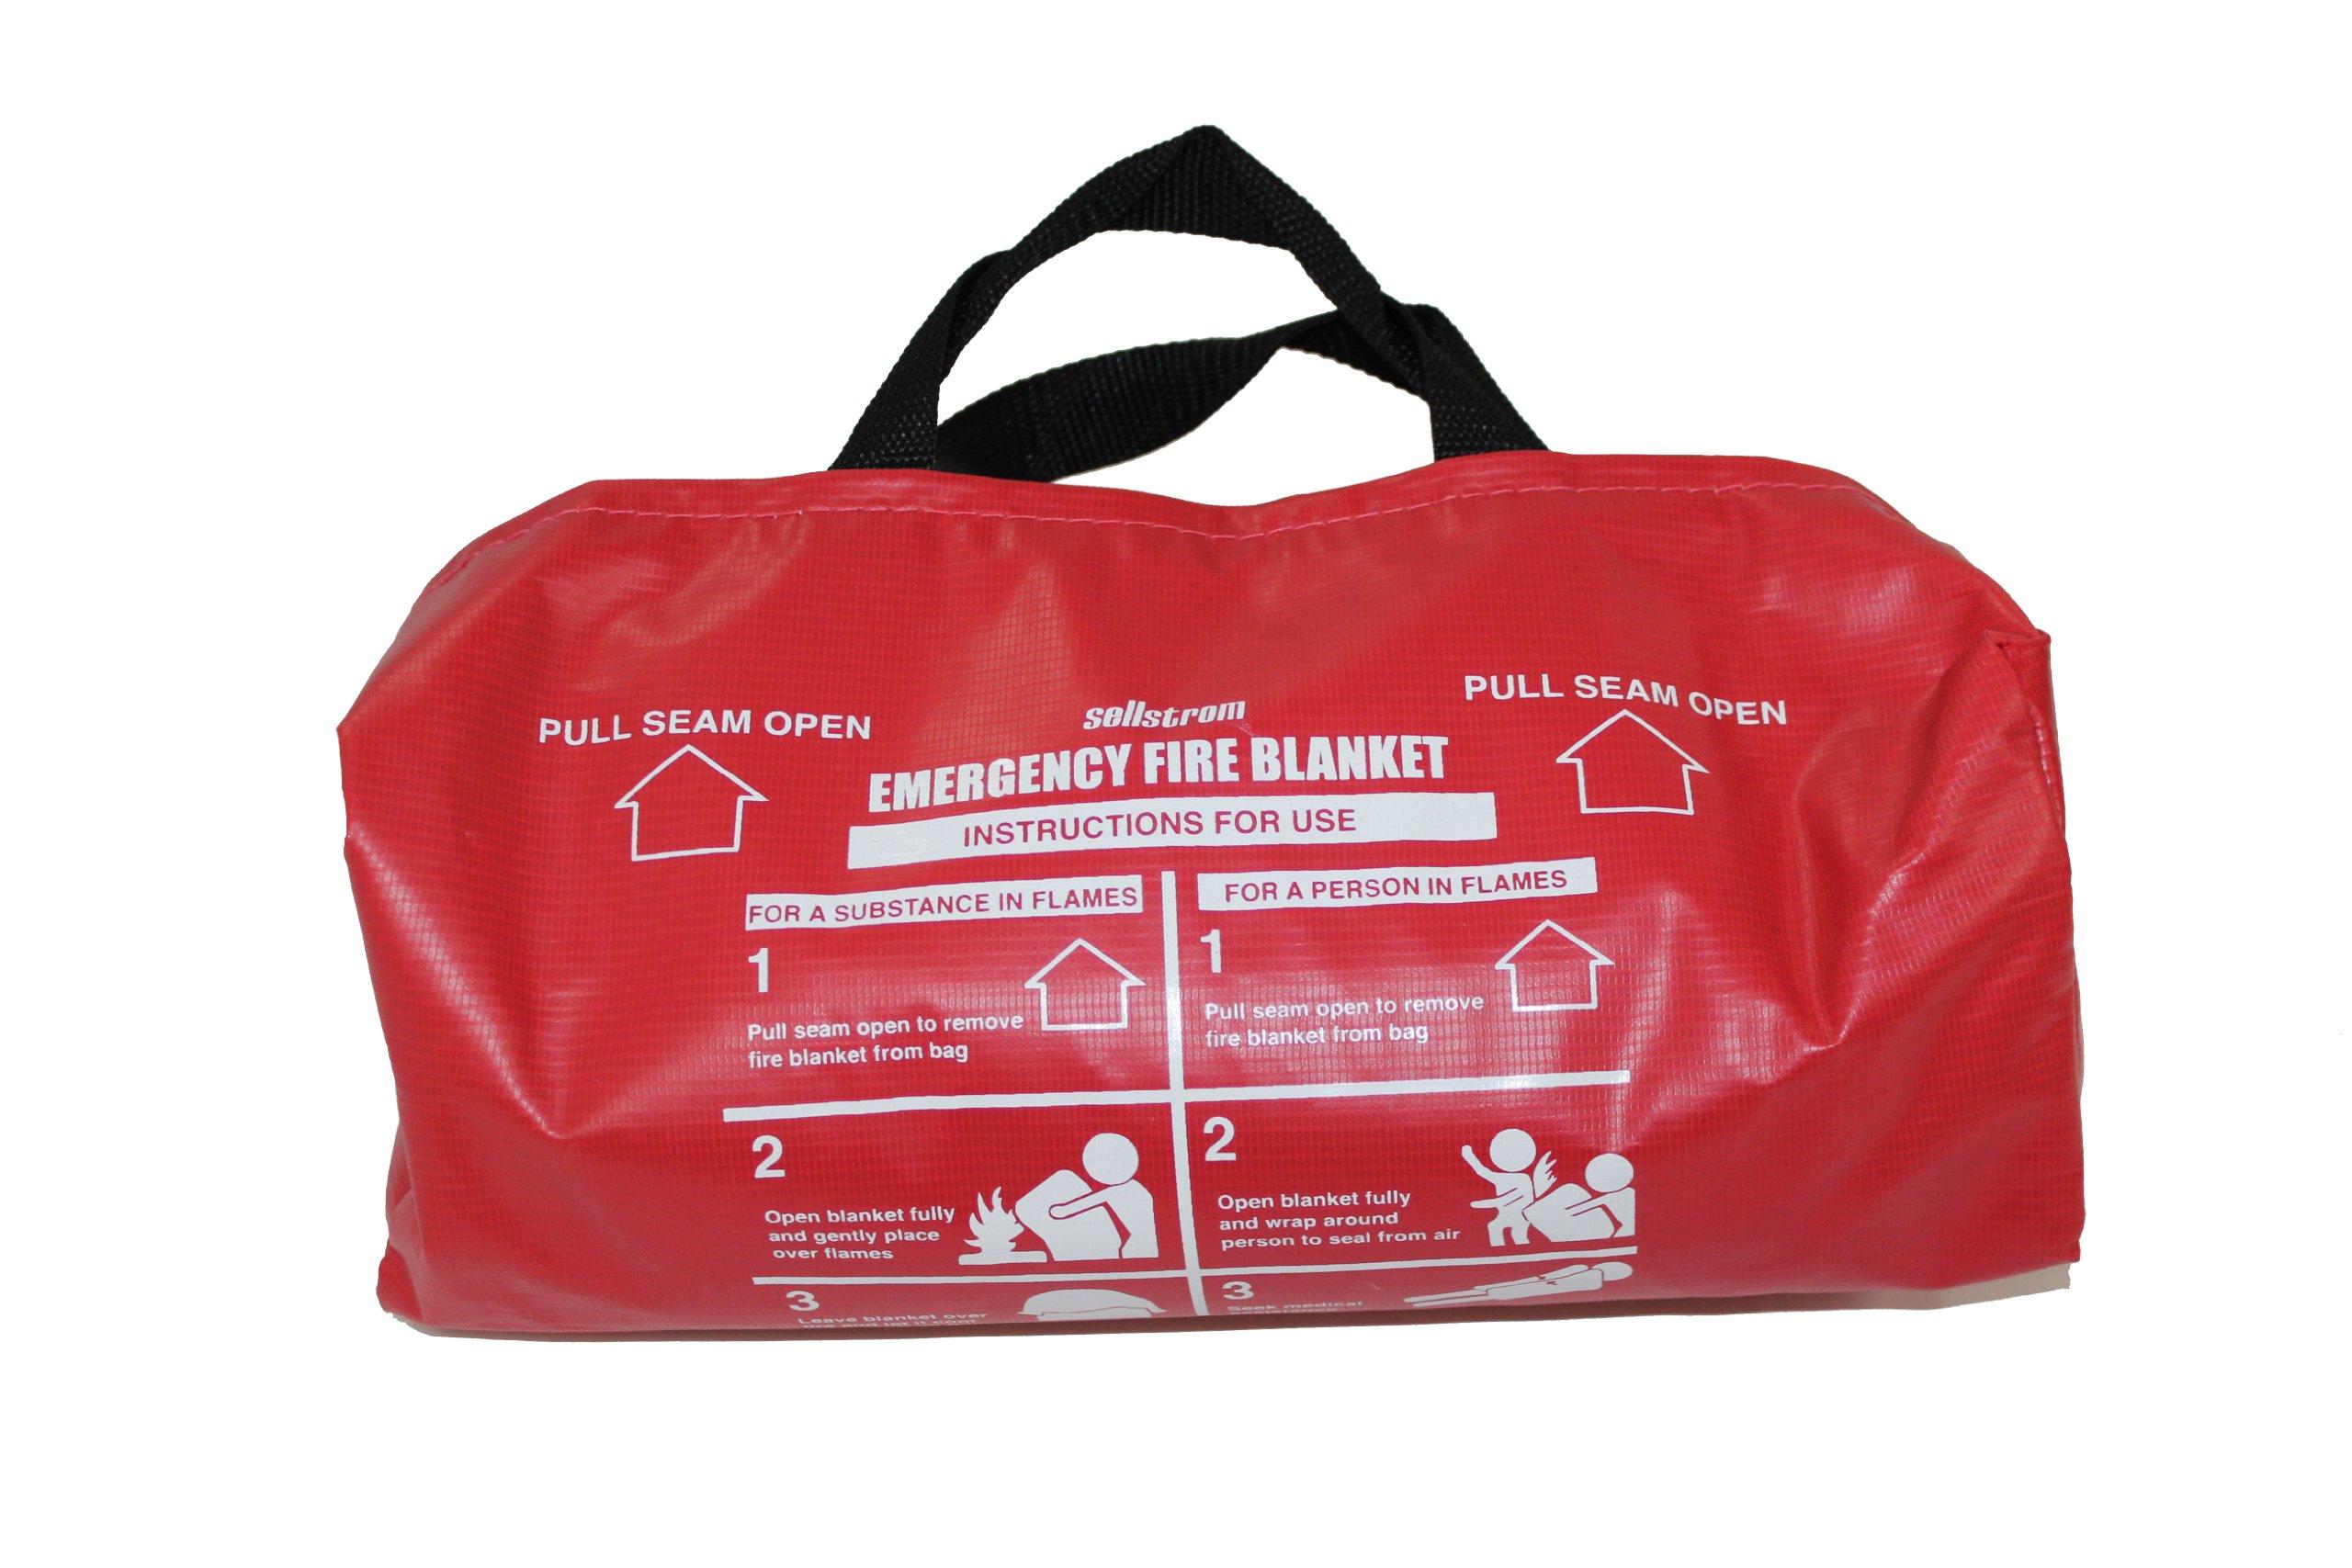 Sellstrom S97452 Fiberglass, Emergency High Temperature Fire Blanket (1,000 Deg F) with Small Red Vinyl Handle Bag, 6' Length x 5' Width, White